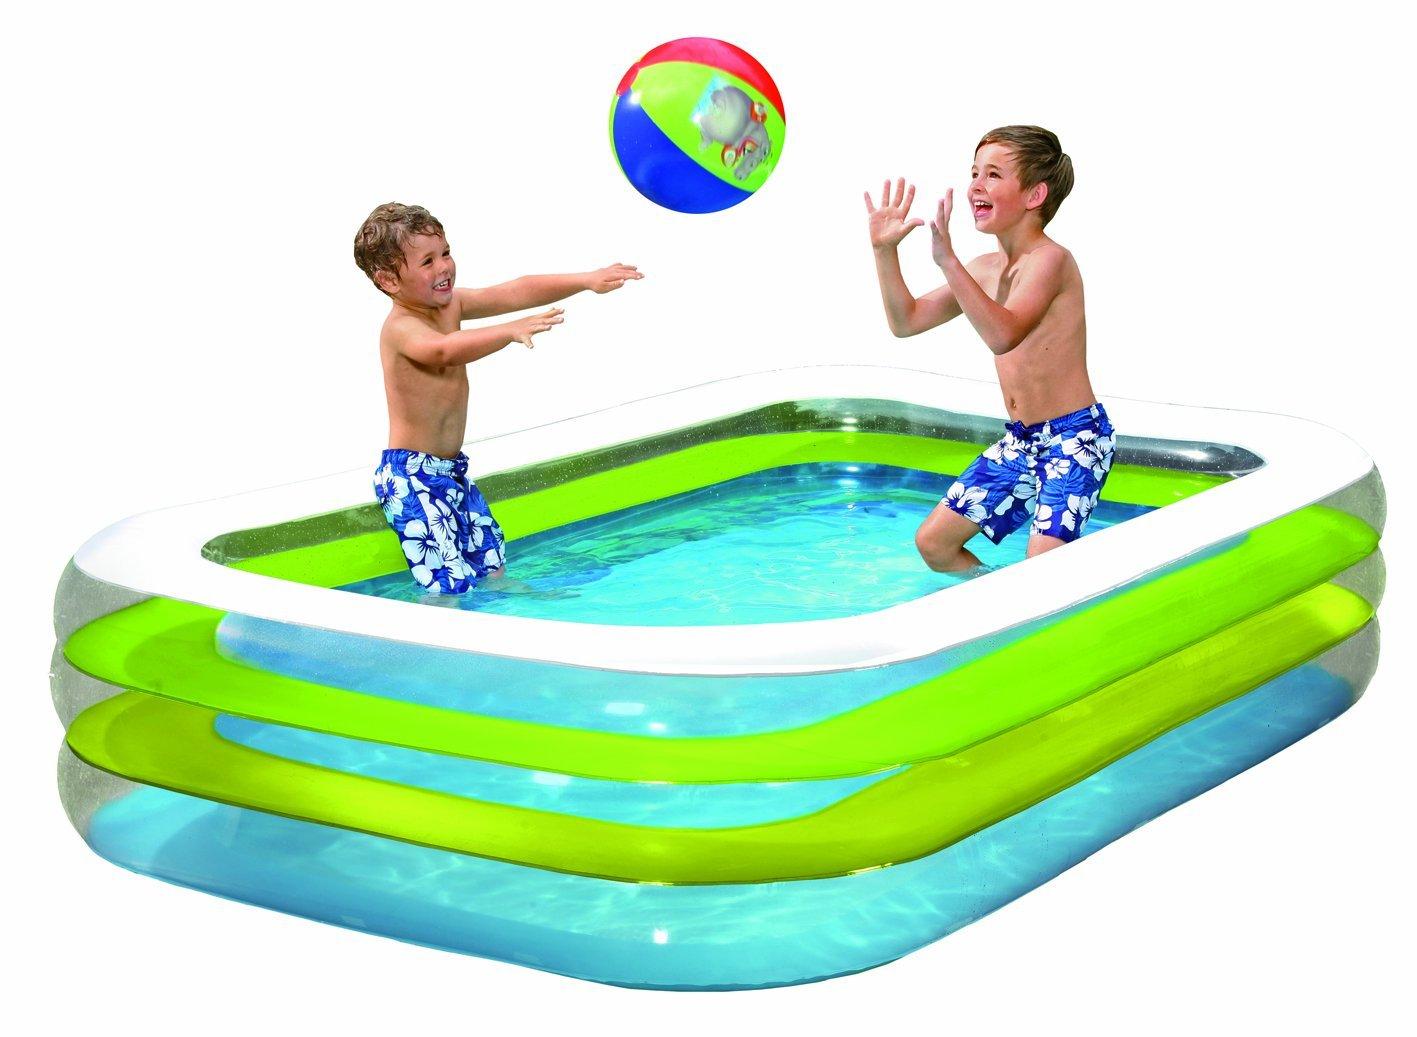 Swimmingpool aufblasbar rechteckig  Planschbecken rechteckig - Die Top 5 der rechteckigen ...